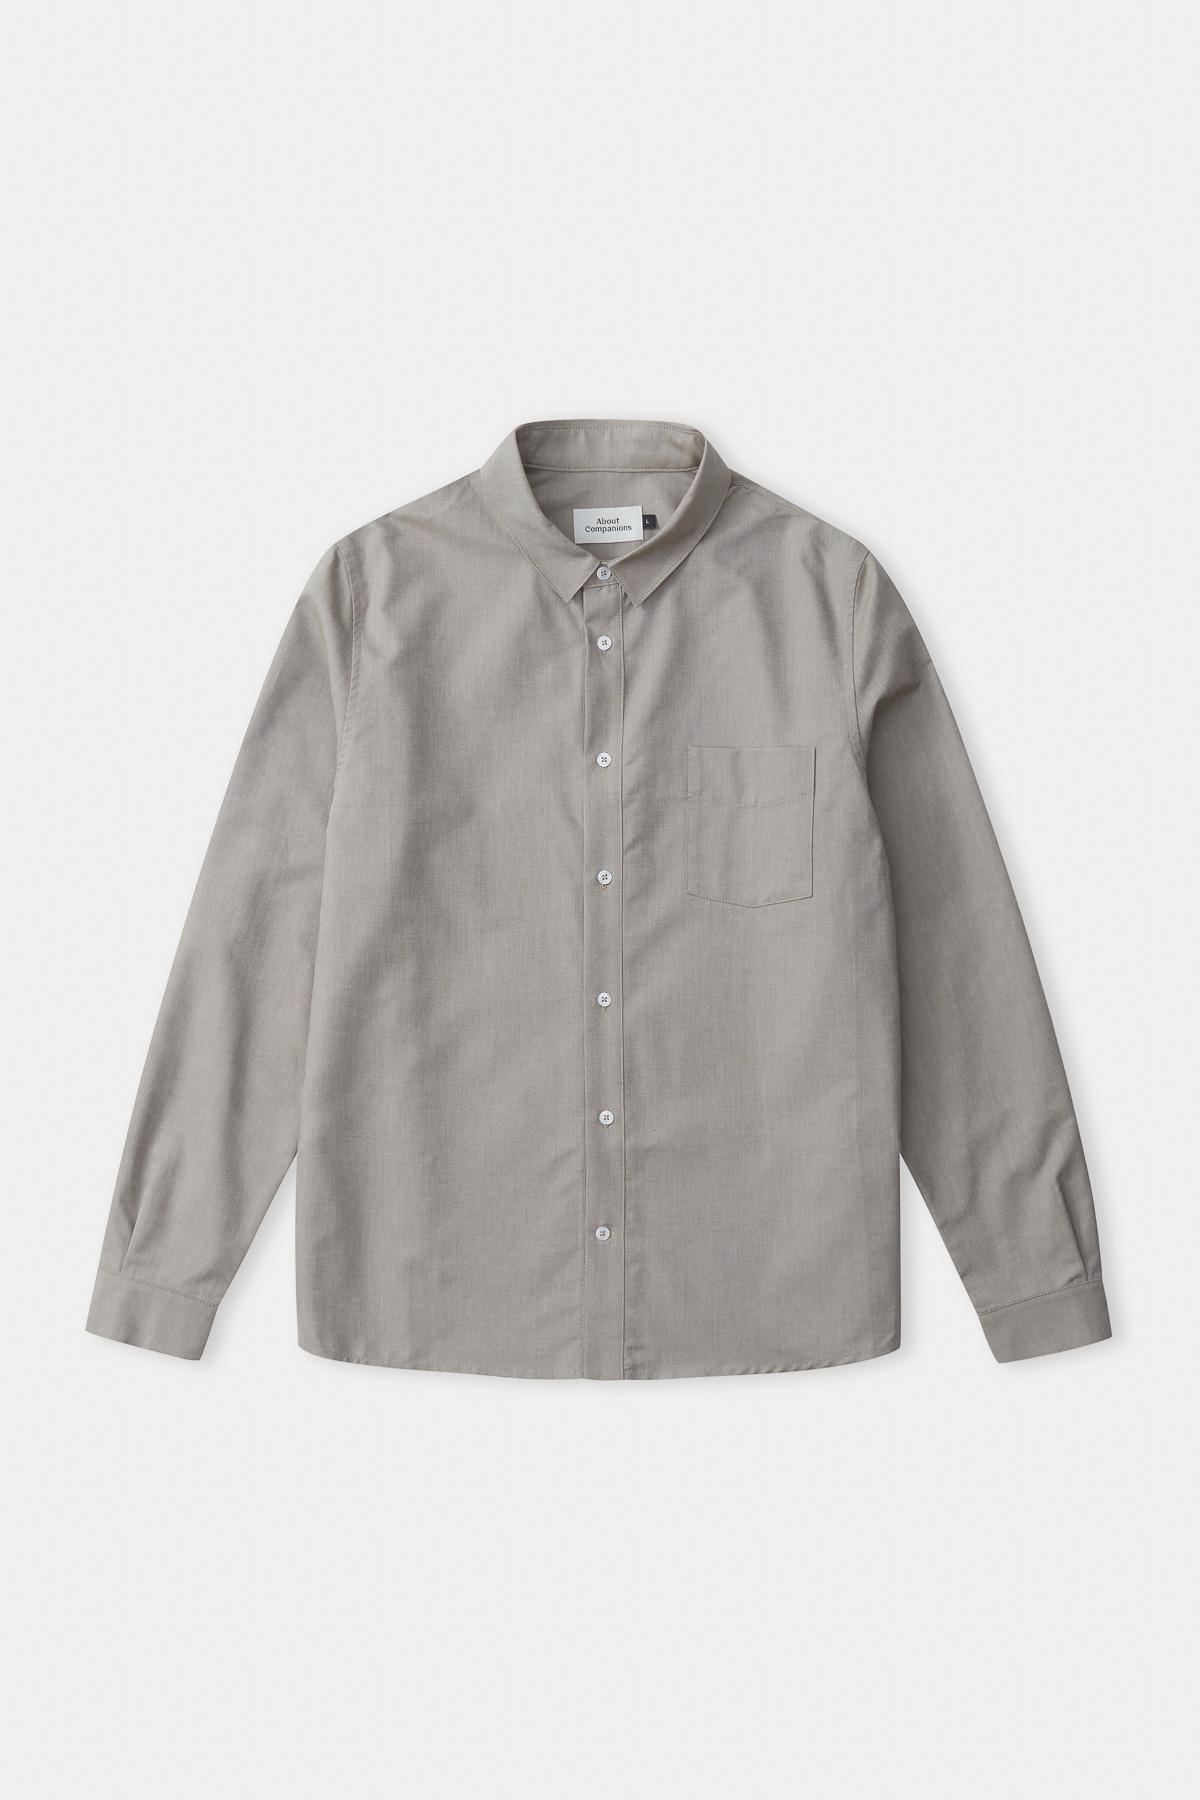 simon shirt, dusty olive, herren - aco